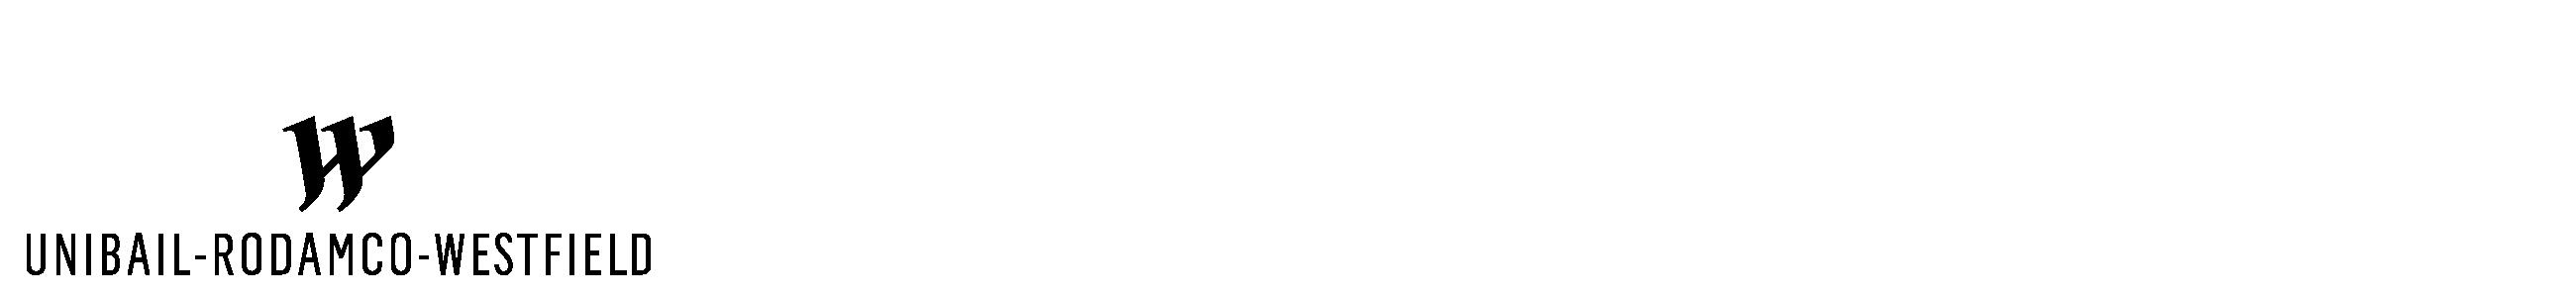 MADHOUSE – WEB_V3_ SNOOPY- CLIENTES